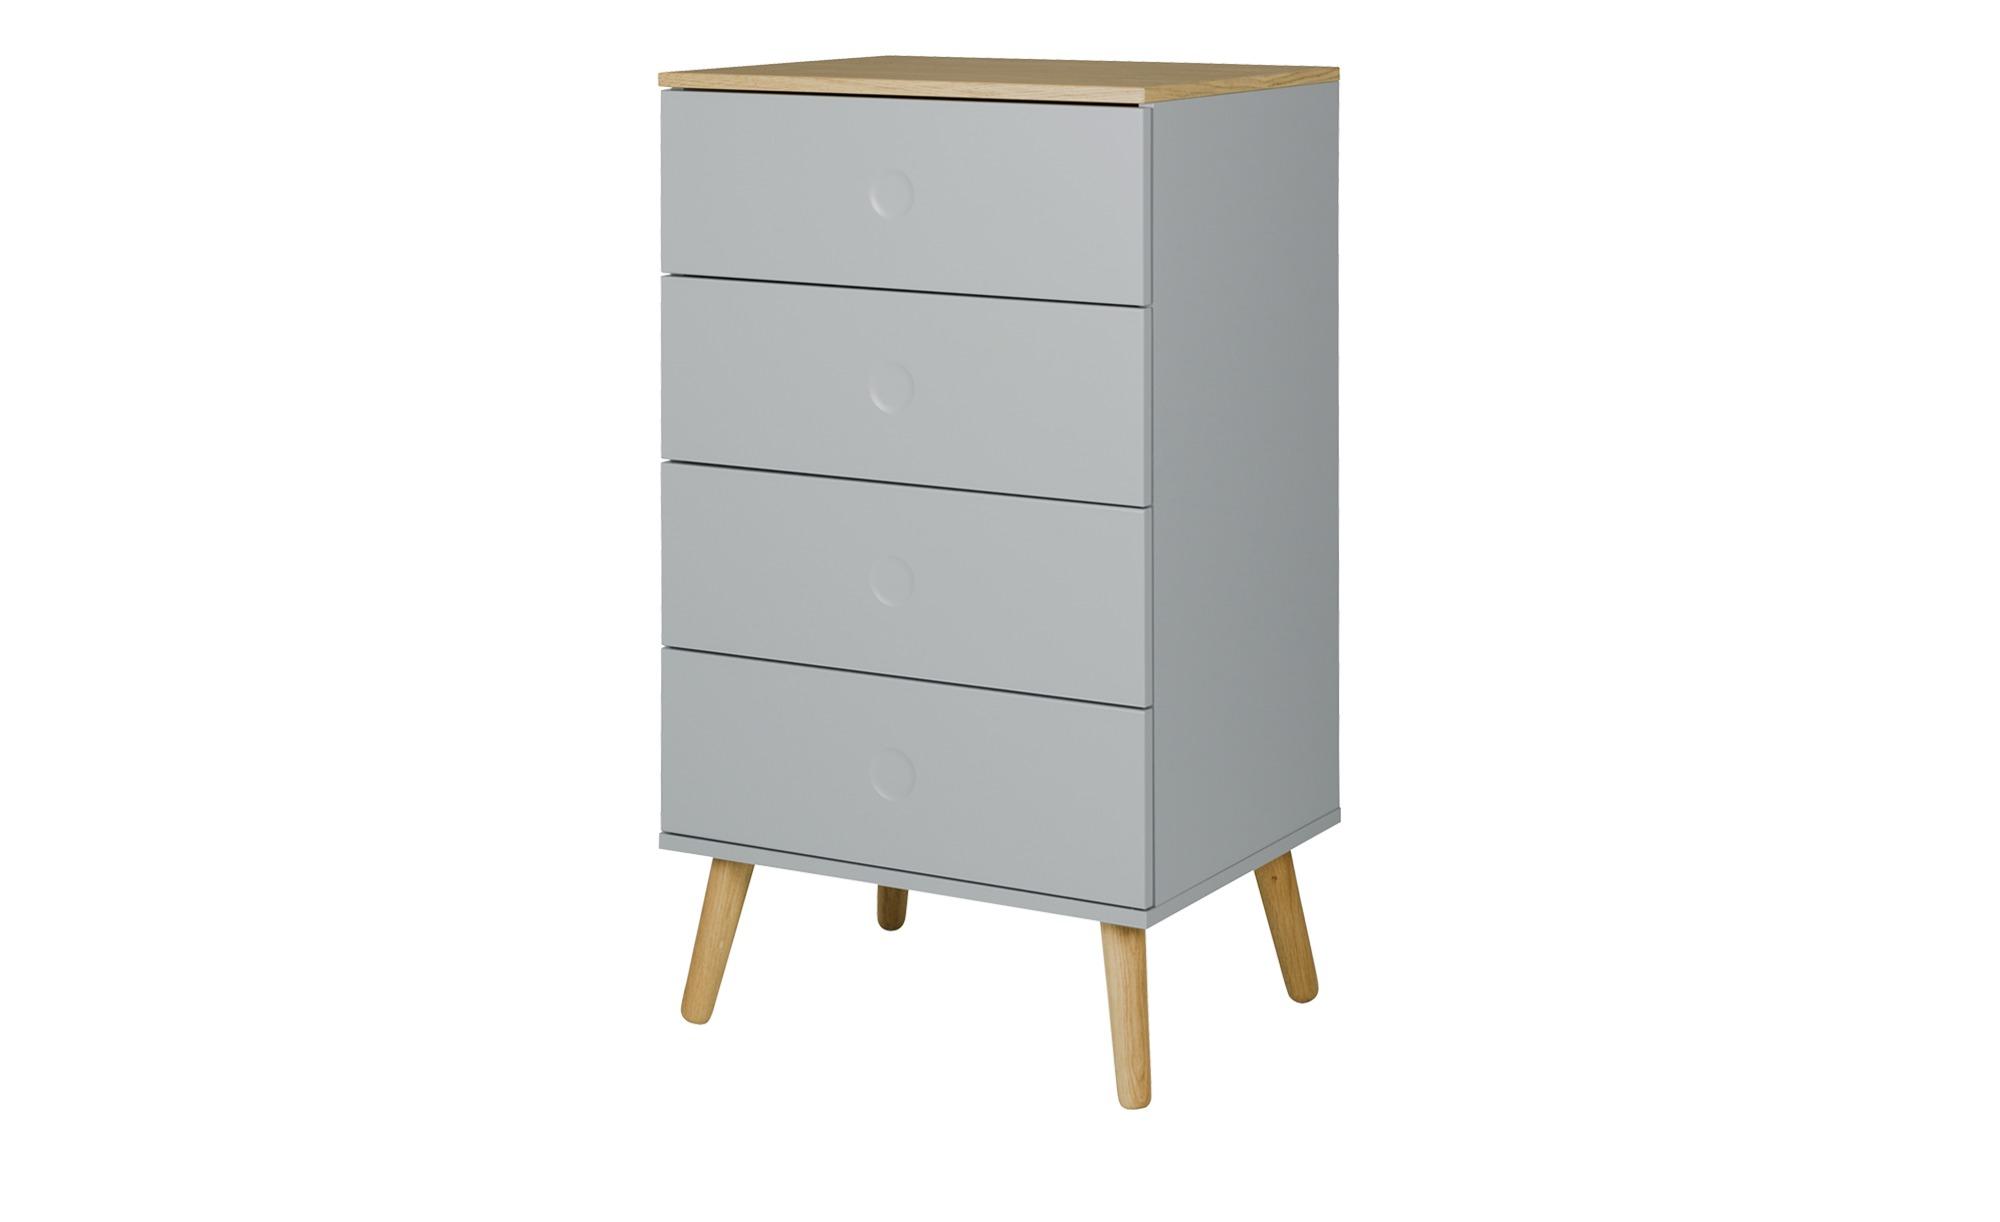 roomers kommode scan breite 55 cm h he 98 cm online kaufen bei woonio. Black Bedroom Furniture Sets. Home Design Ideas